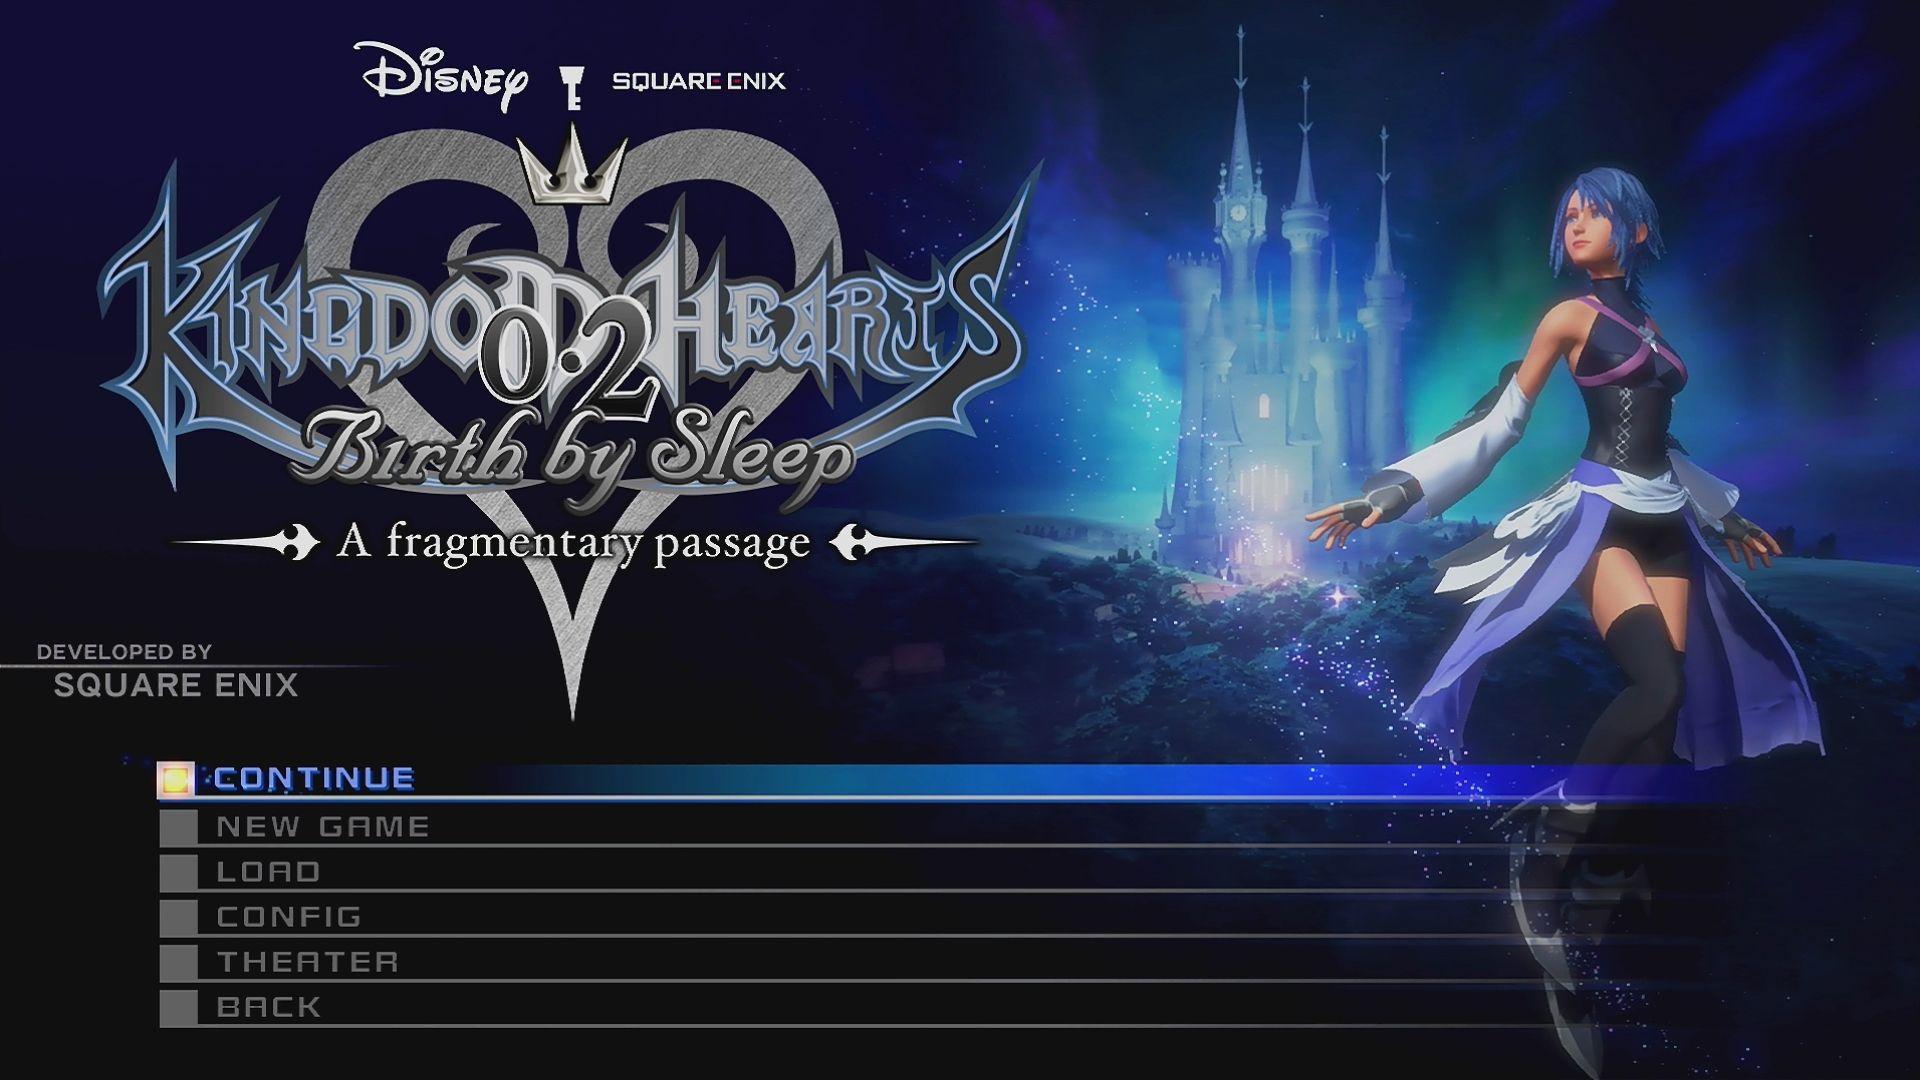 Kingdom Hearts 0.2 Birth by Sleep - A fragmentary passage -